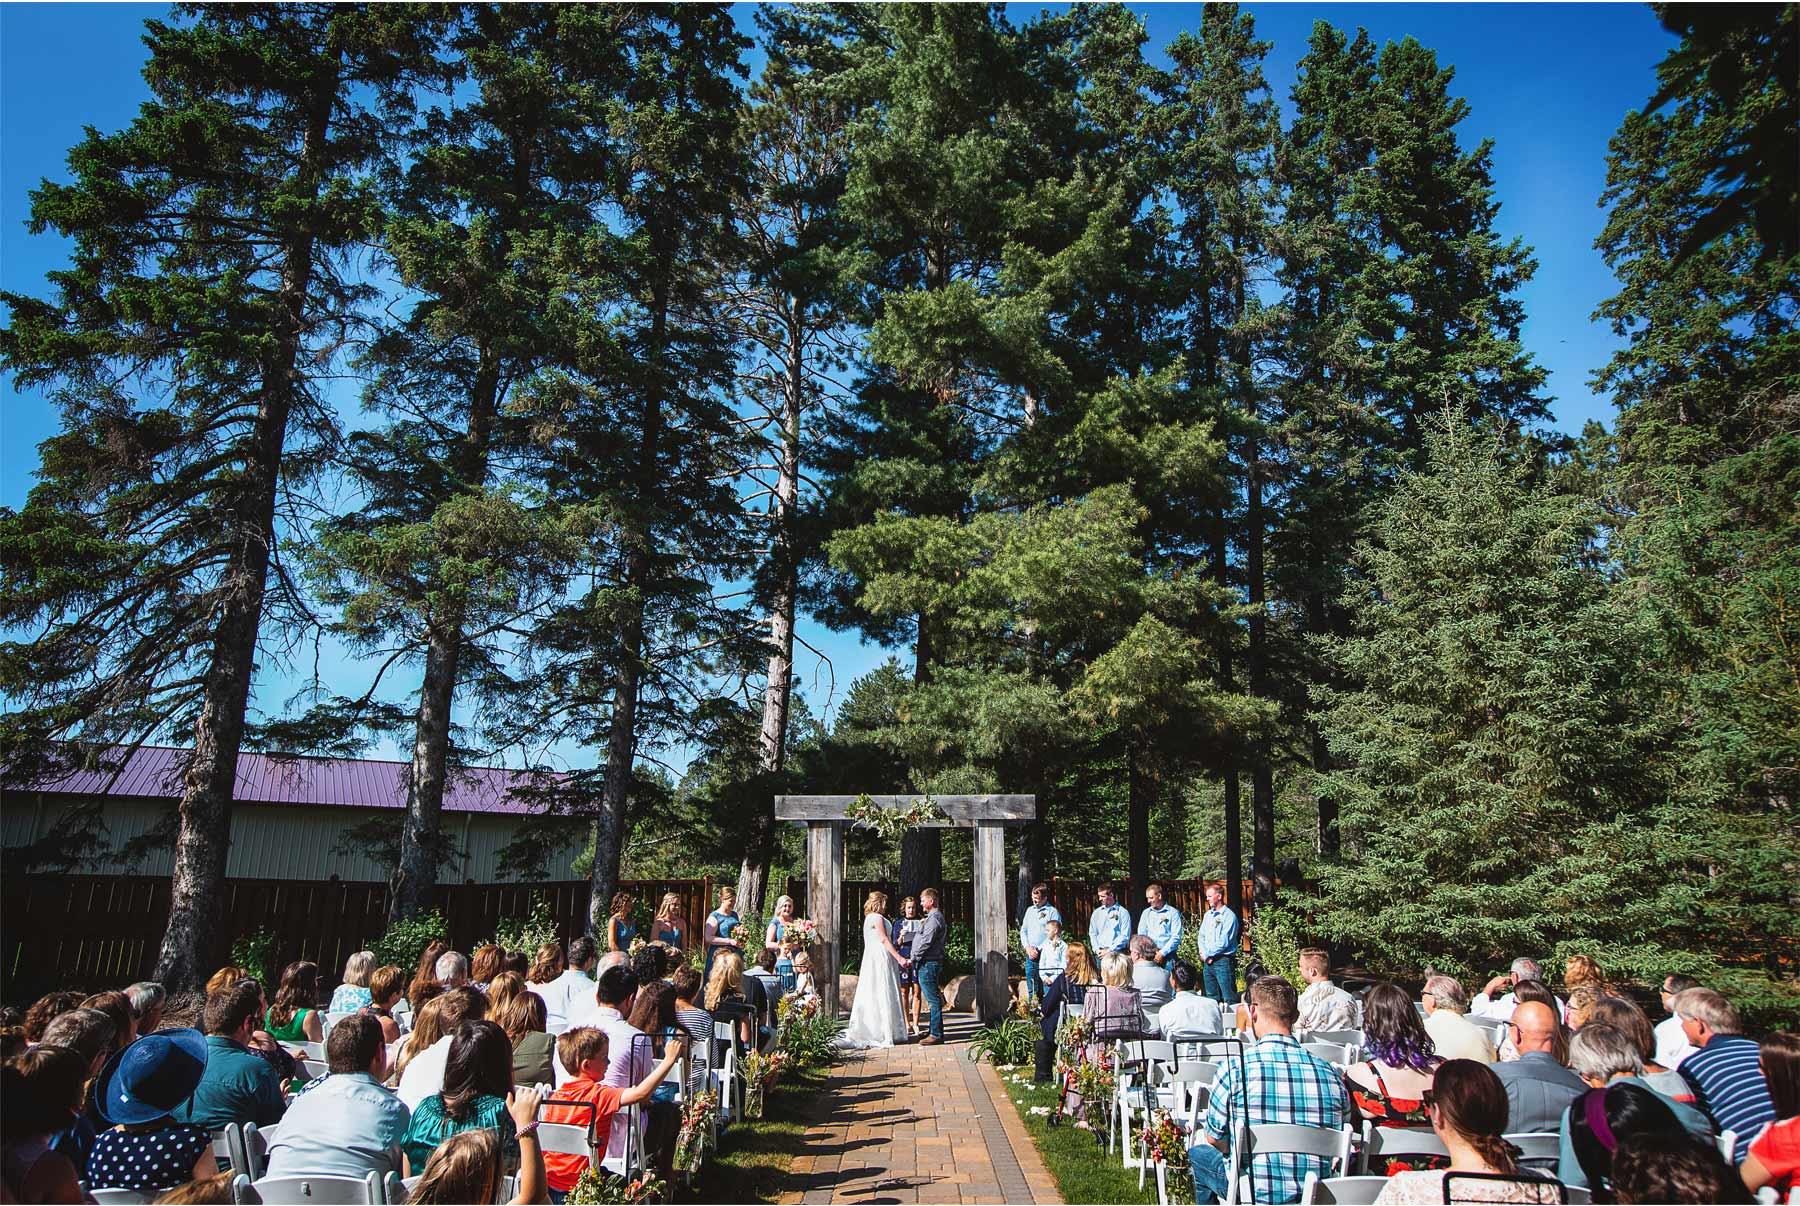 08-Vick-Photography-Wedding-Brainerd-Minnesota-Pine-Peaks-Lodge-Cabin-Rustic-Outdoor-Ceremony-Kristi-and-Noel.jpg